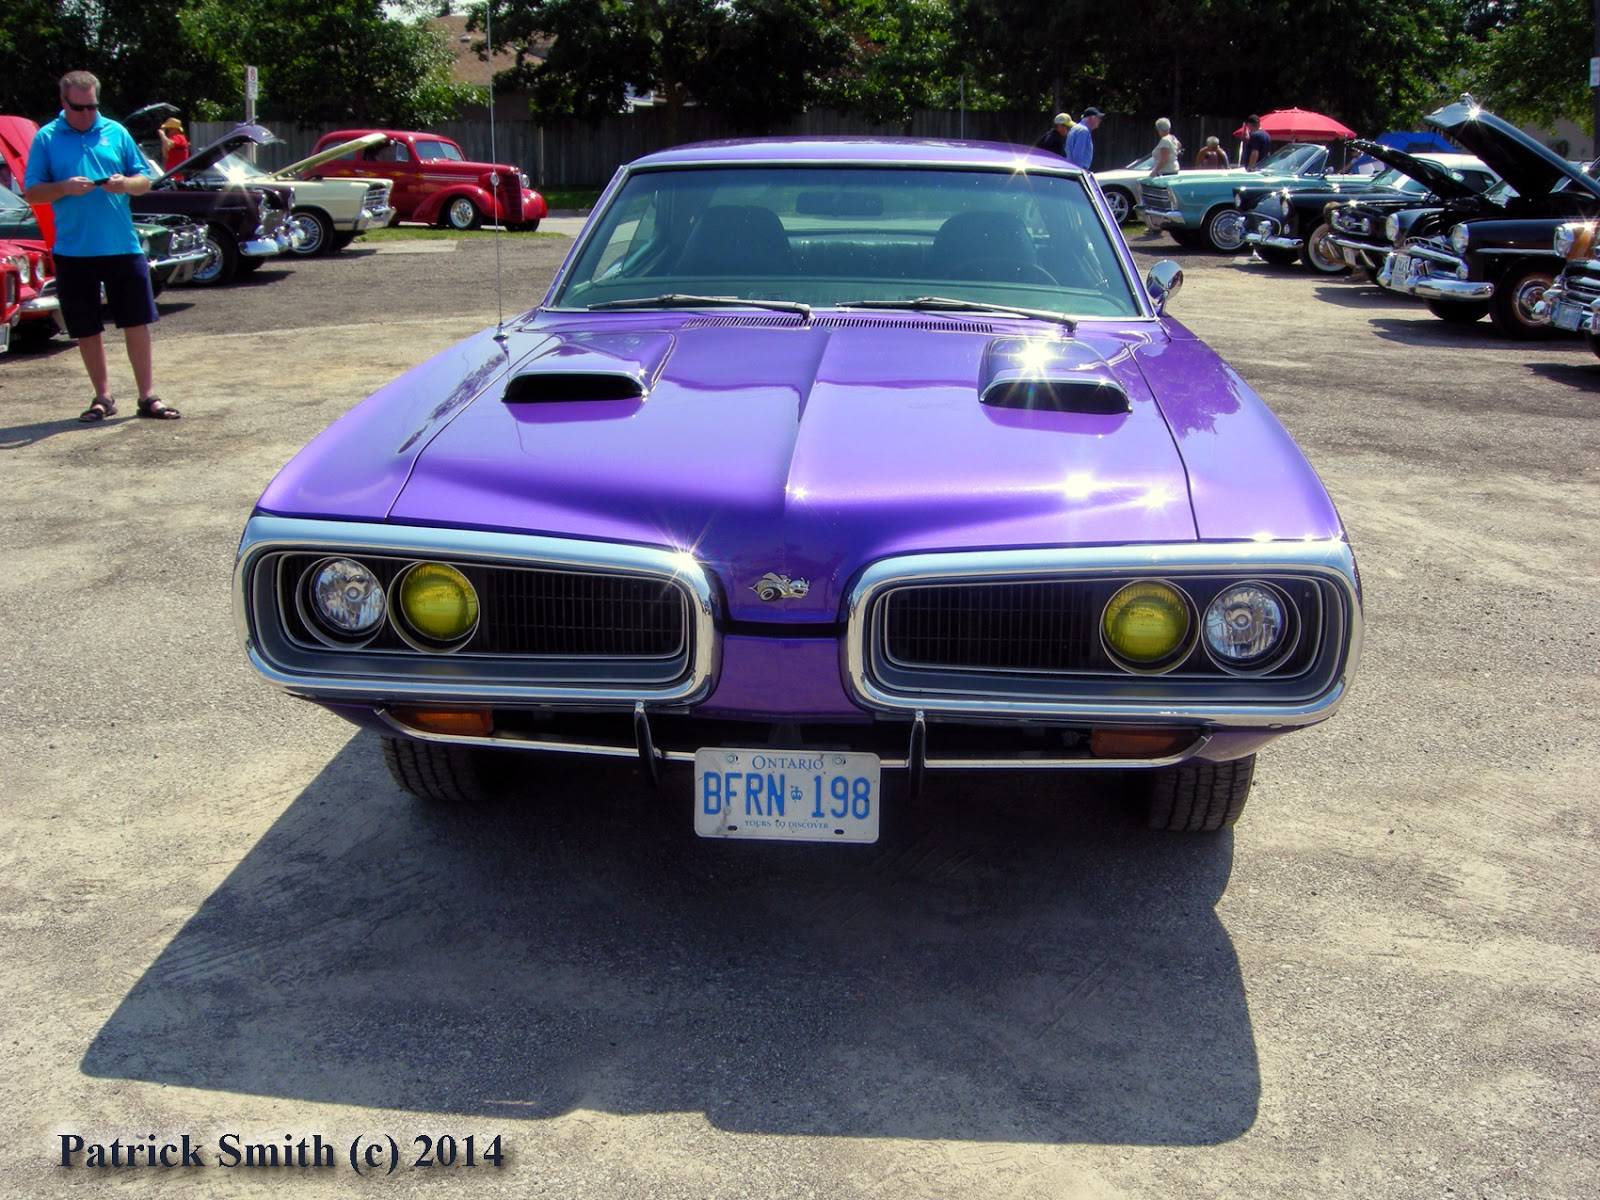 1970 Dodge Super Bee: Plum Crazy Purple People Eater